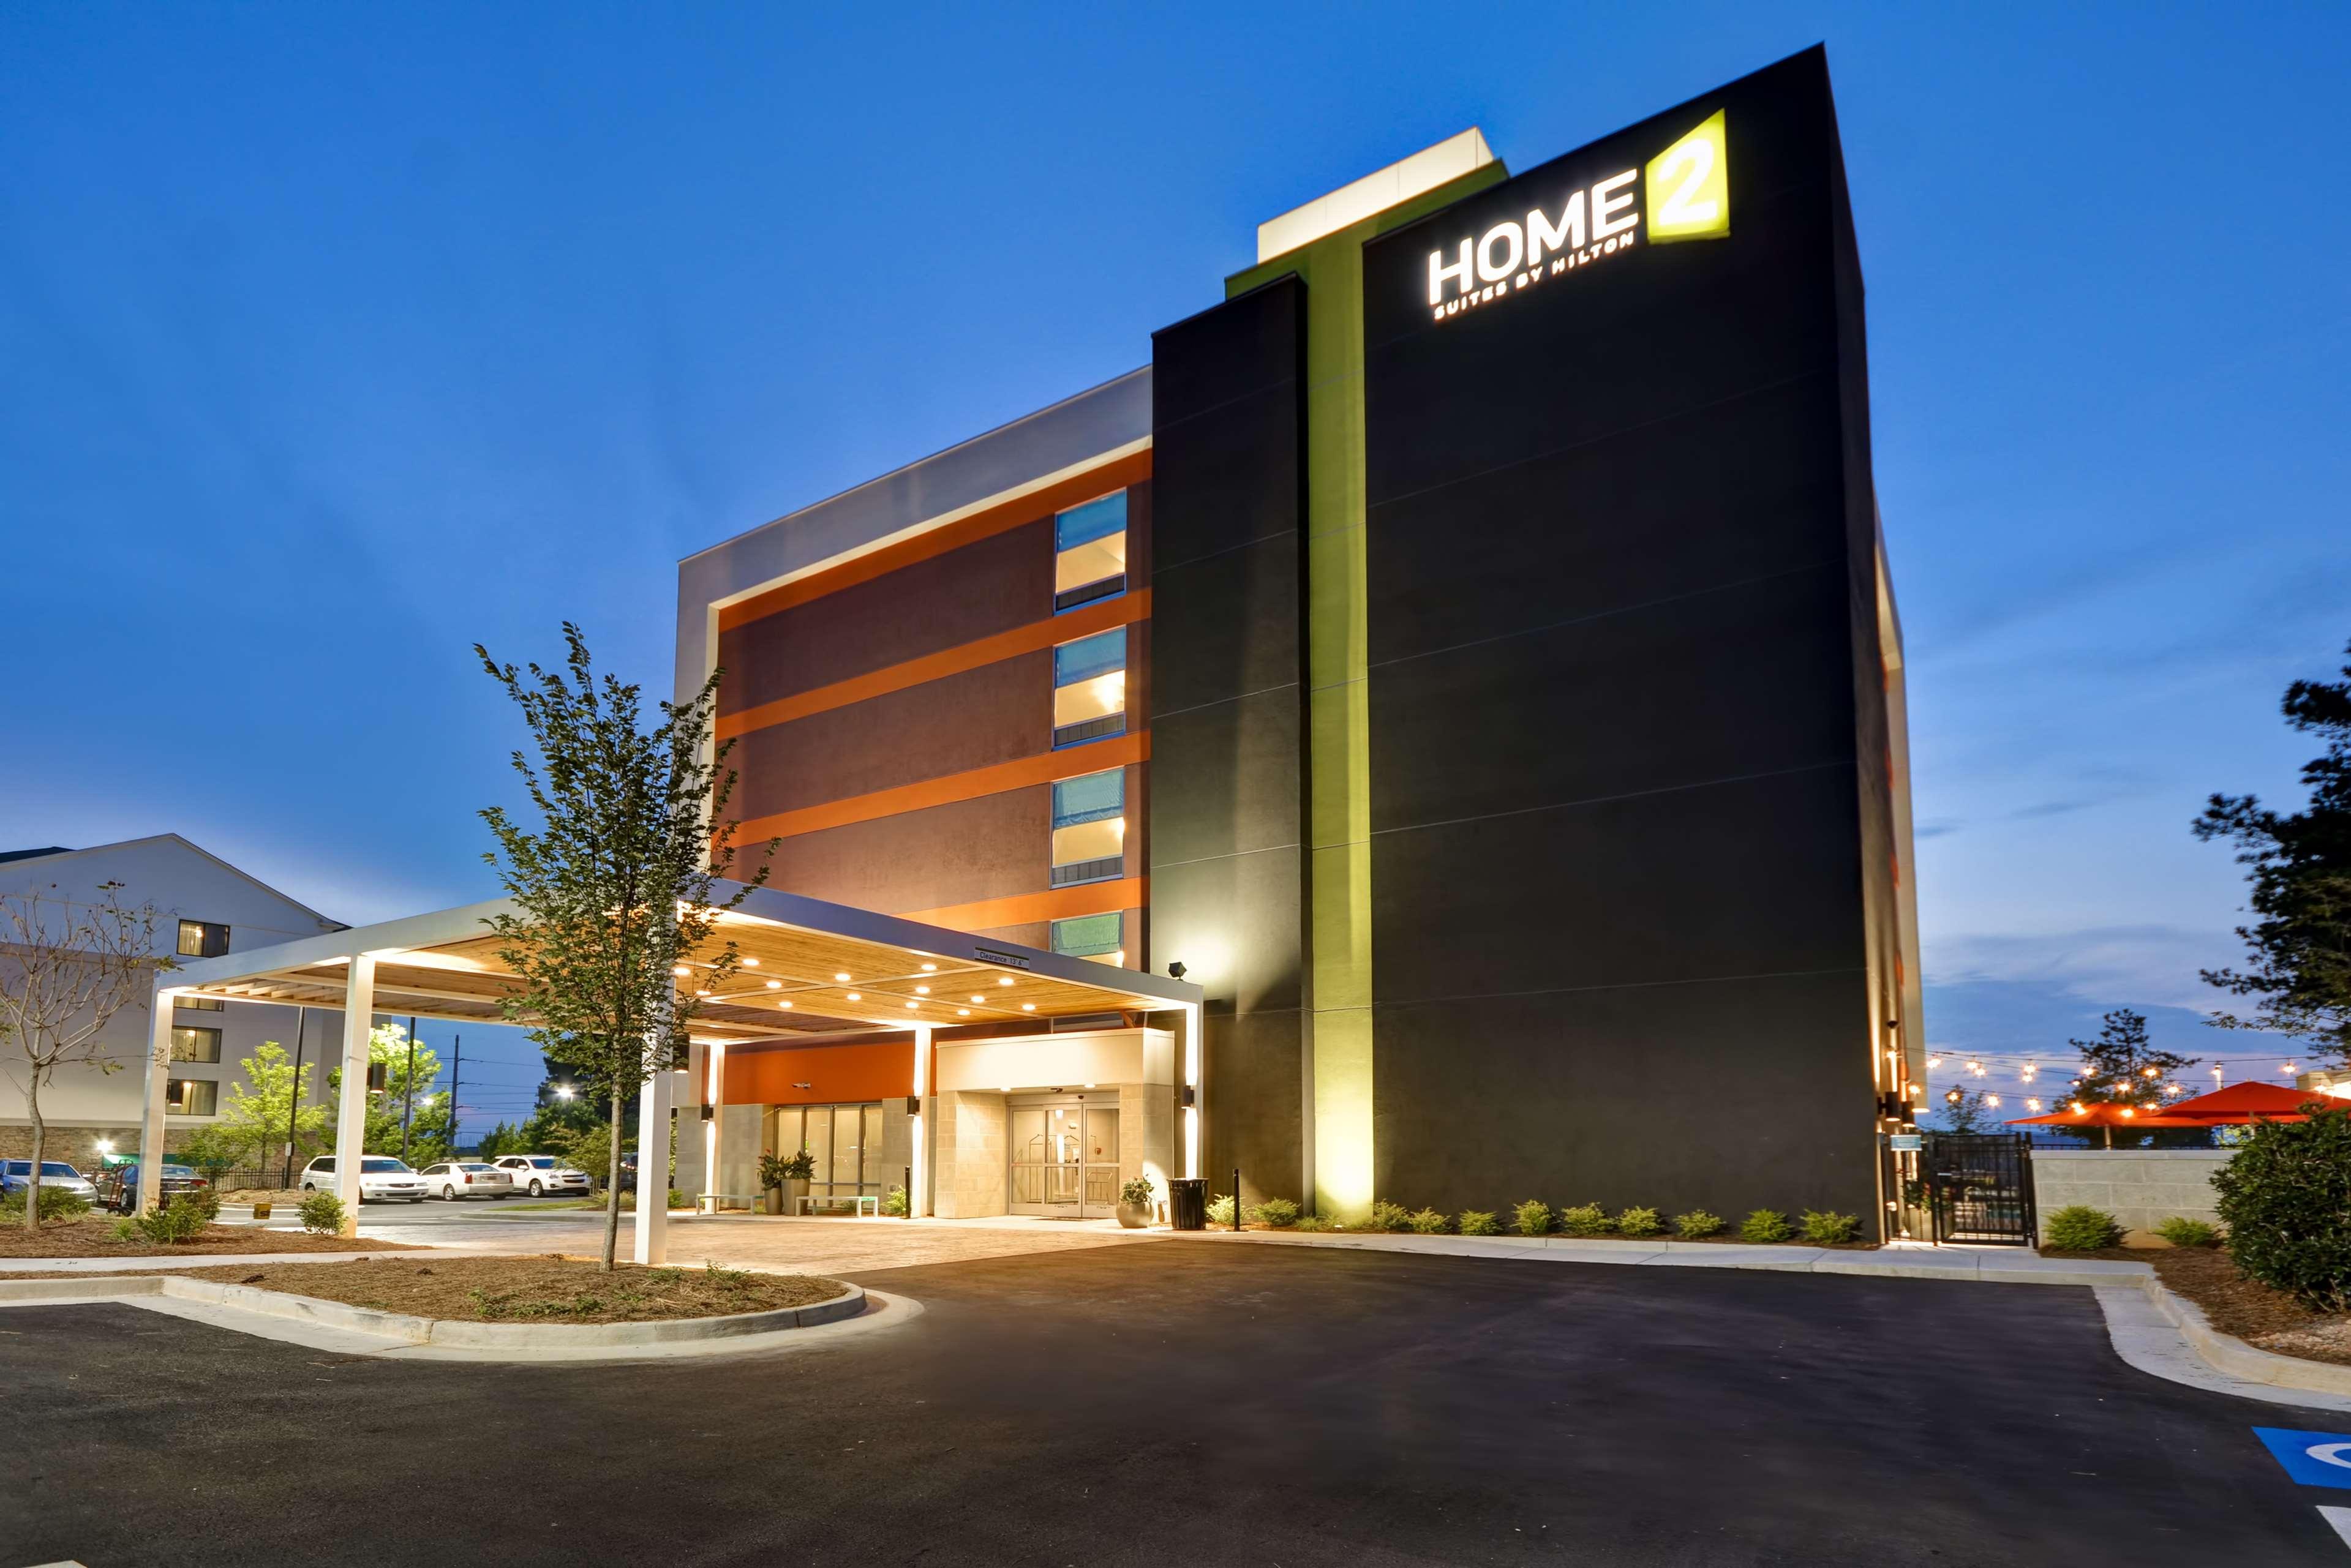 Home2 Suites by Hilton Atlanta West Lithia Springs image 4